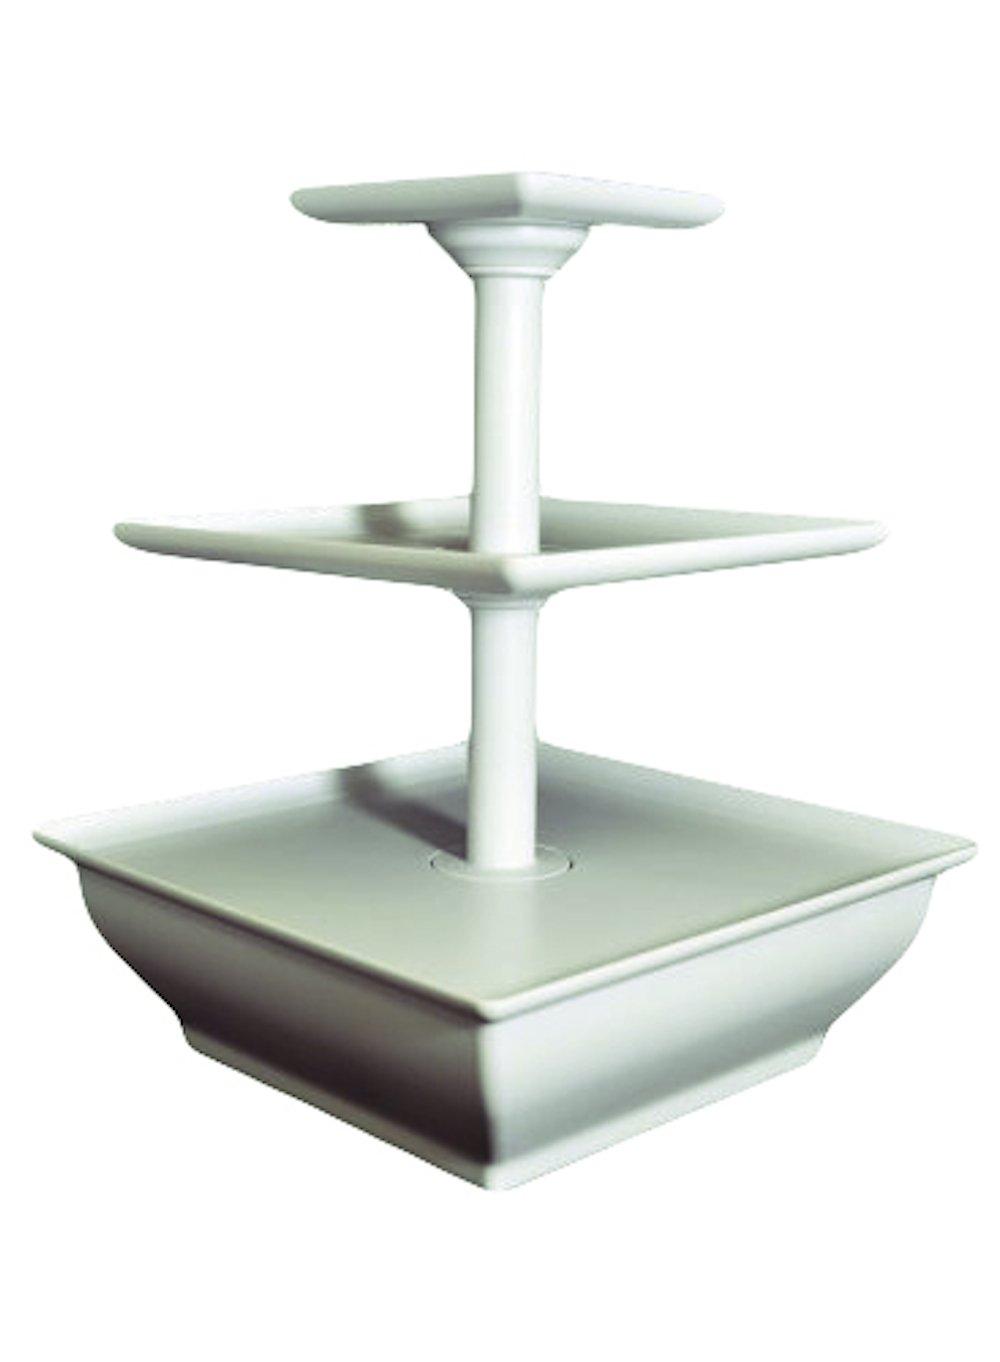 EdgeVantage White Three Tier Server Station - Dessert Tray - Cupcake Stand - Food Display